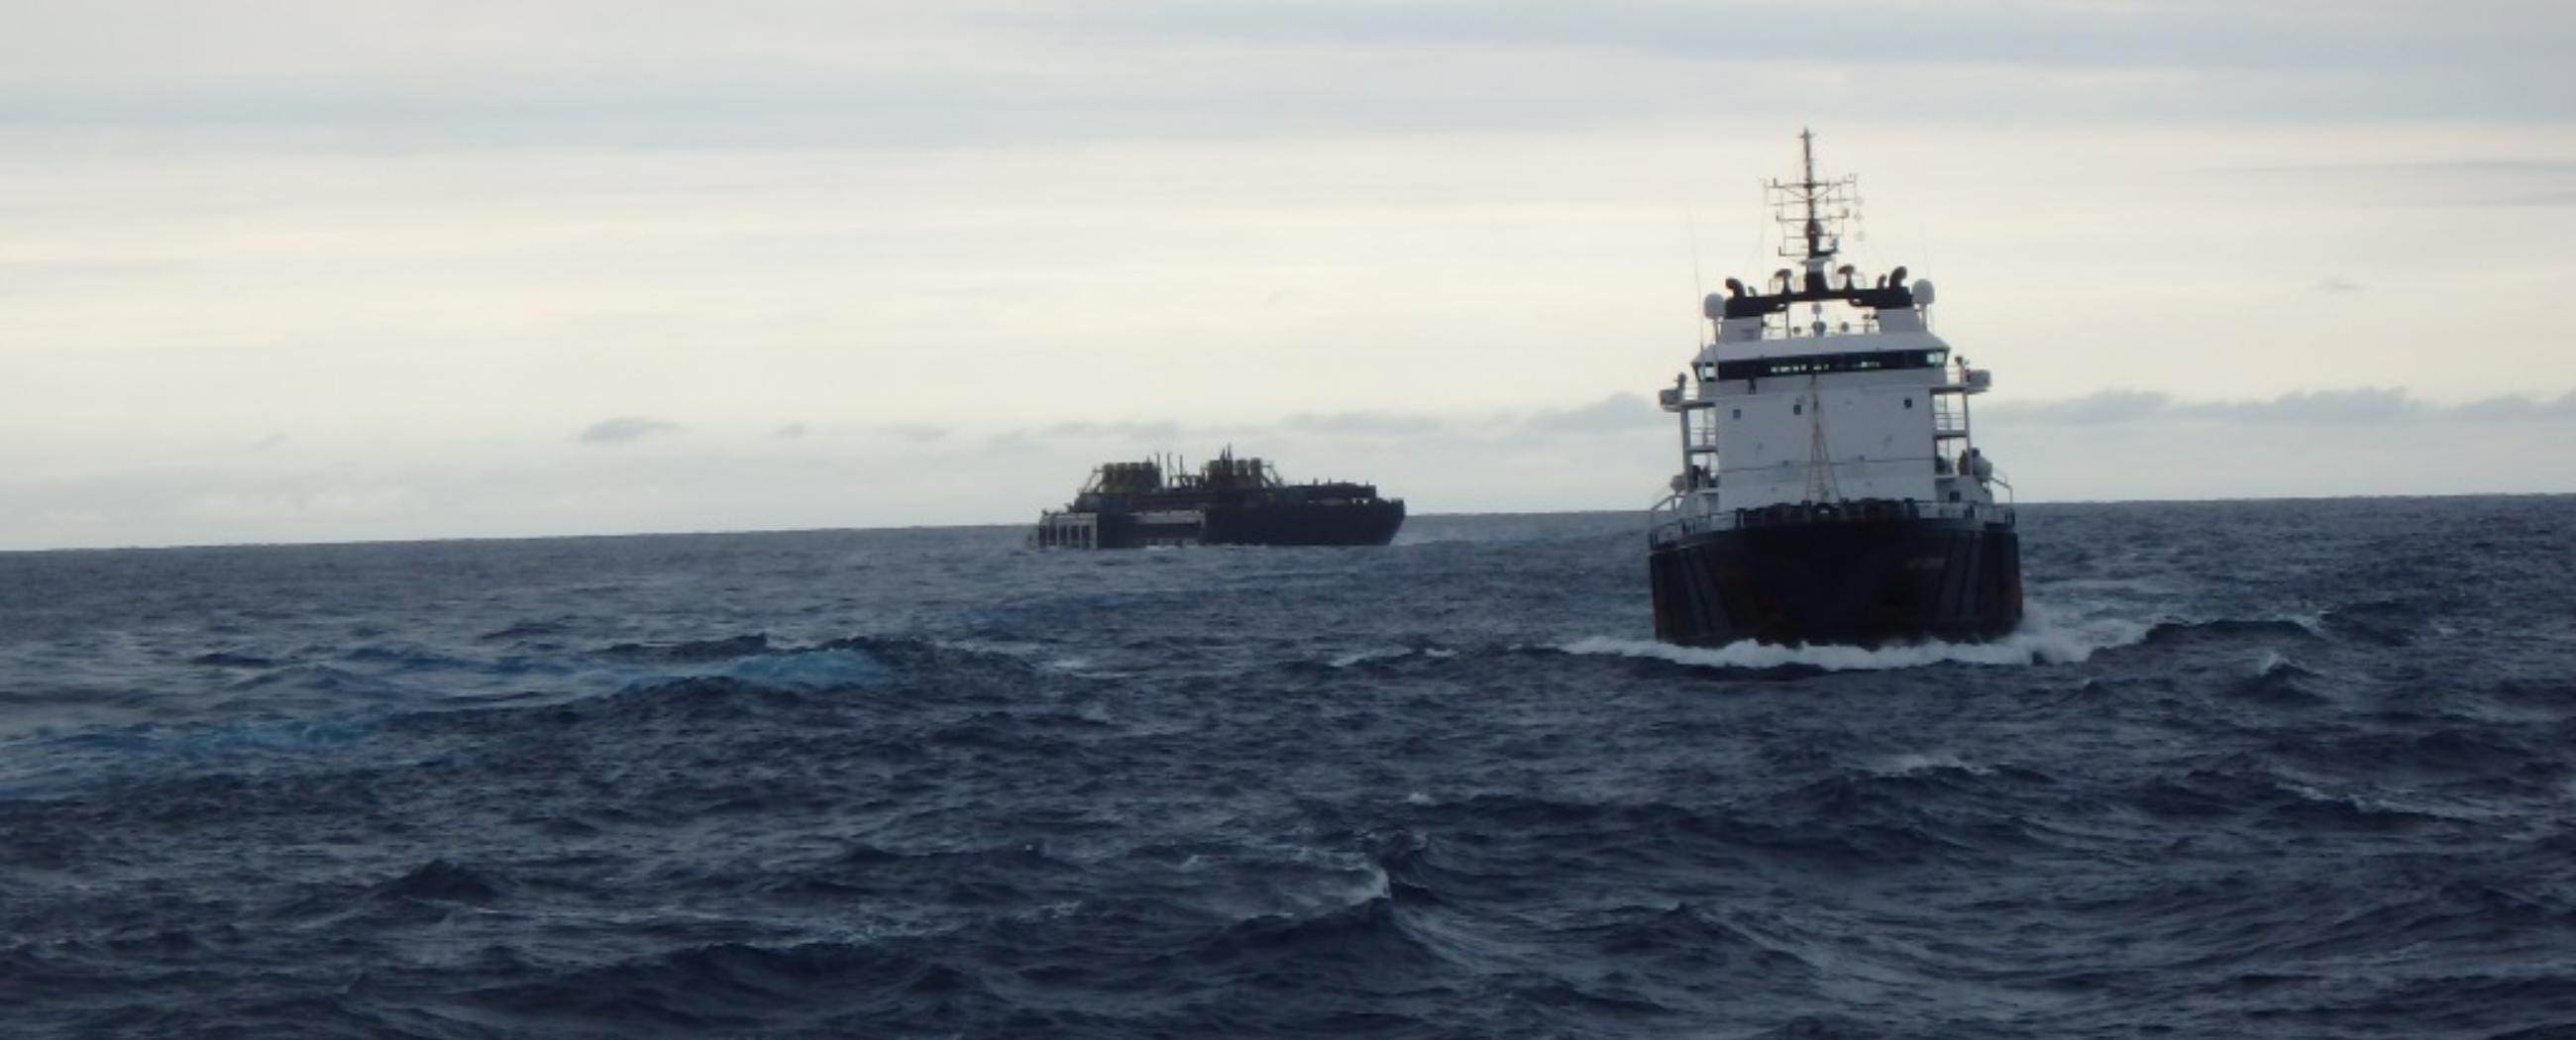 ALP-Centre-towage-of-McDermott-barge-Intermac-650-5.JPG